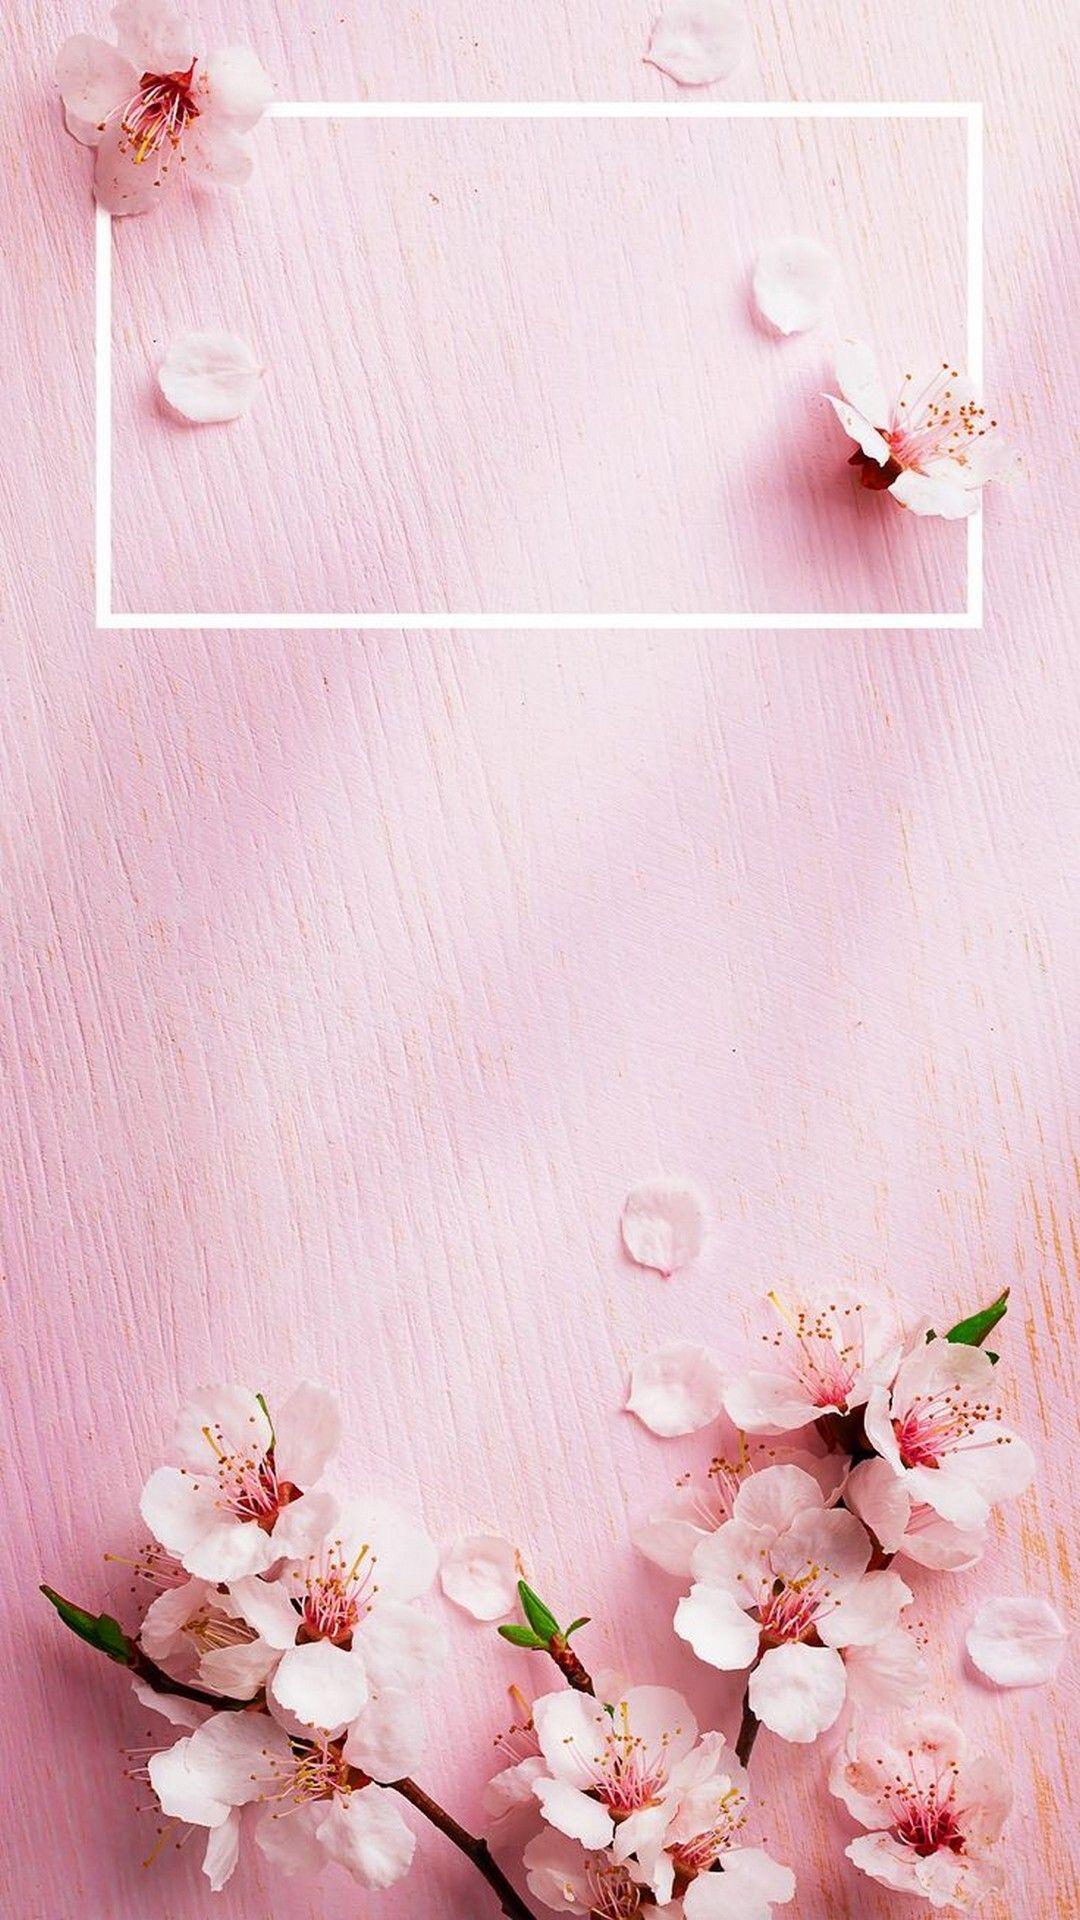 Iphone X Wallpaper Rose Gold Lock Screen 2018 Wallpapers